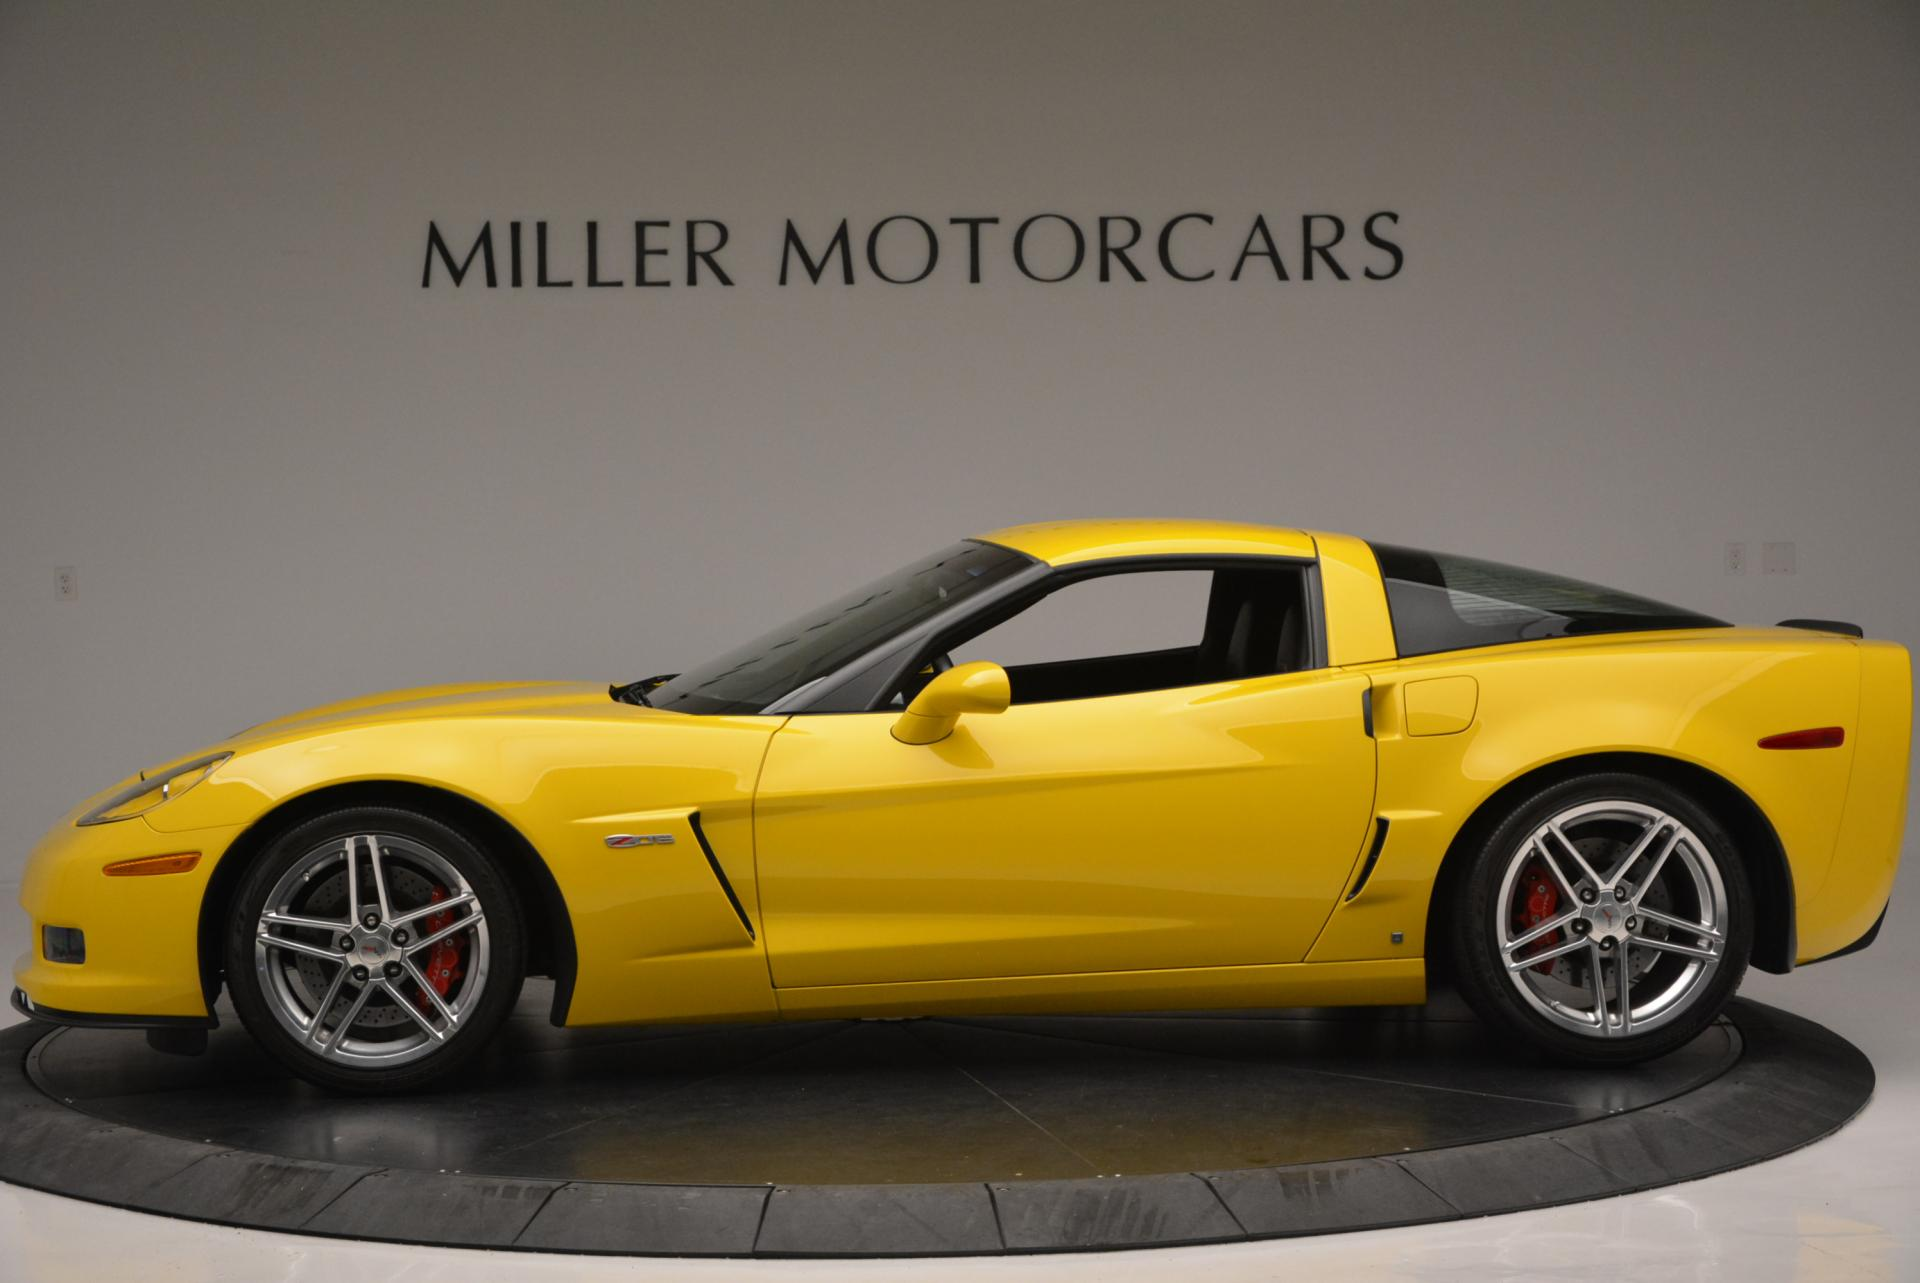 Used 2006 Chevrolet Corvette Z06 Hardtop For Sale In Greenwich, CT. Alfa Romeo of Greenwich, 7085 530_p3